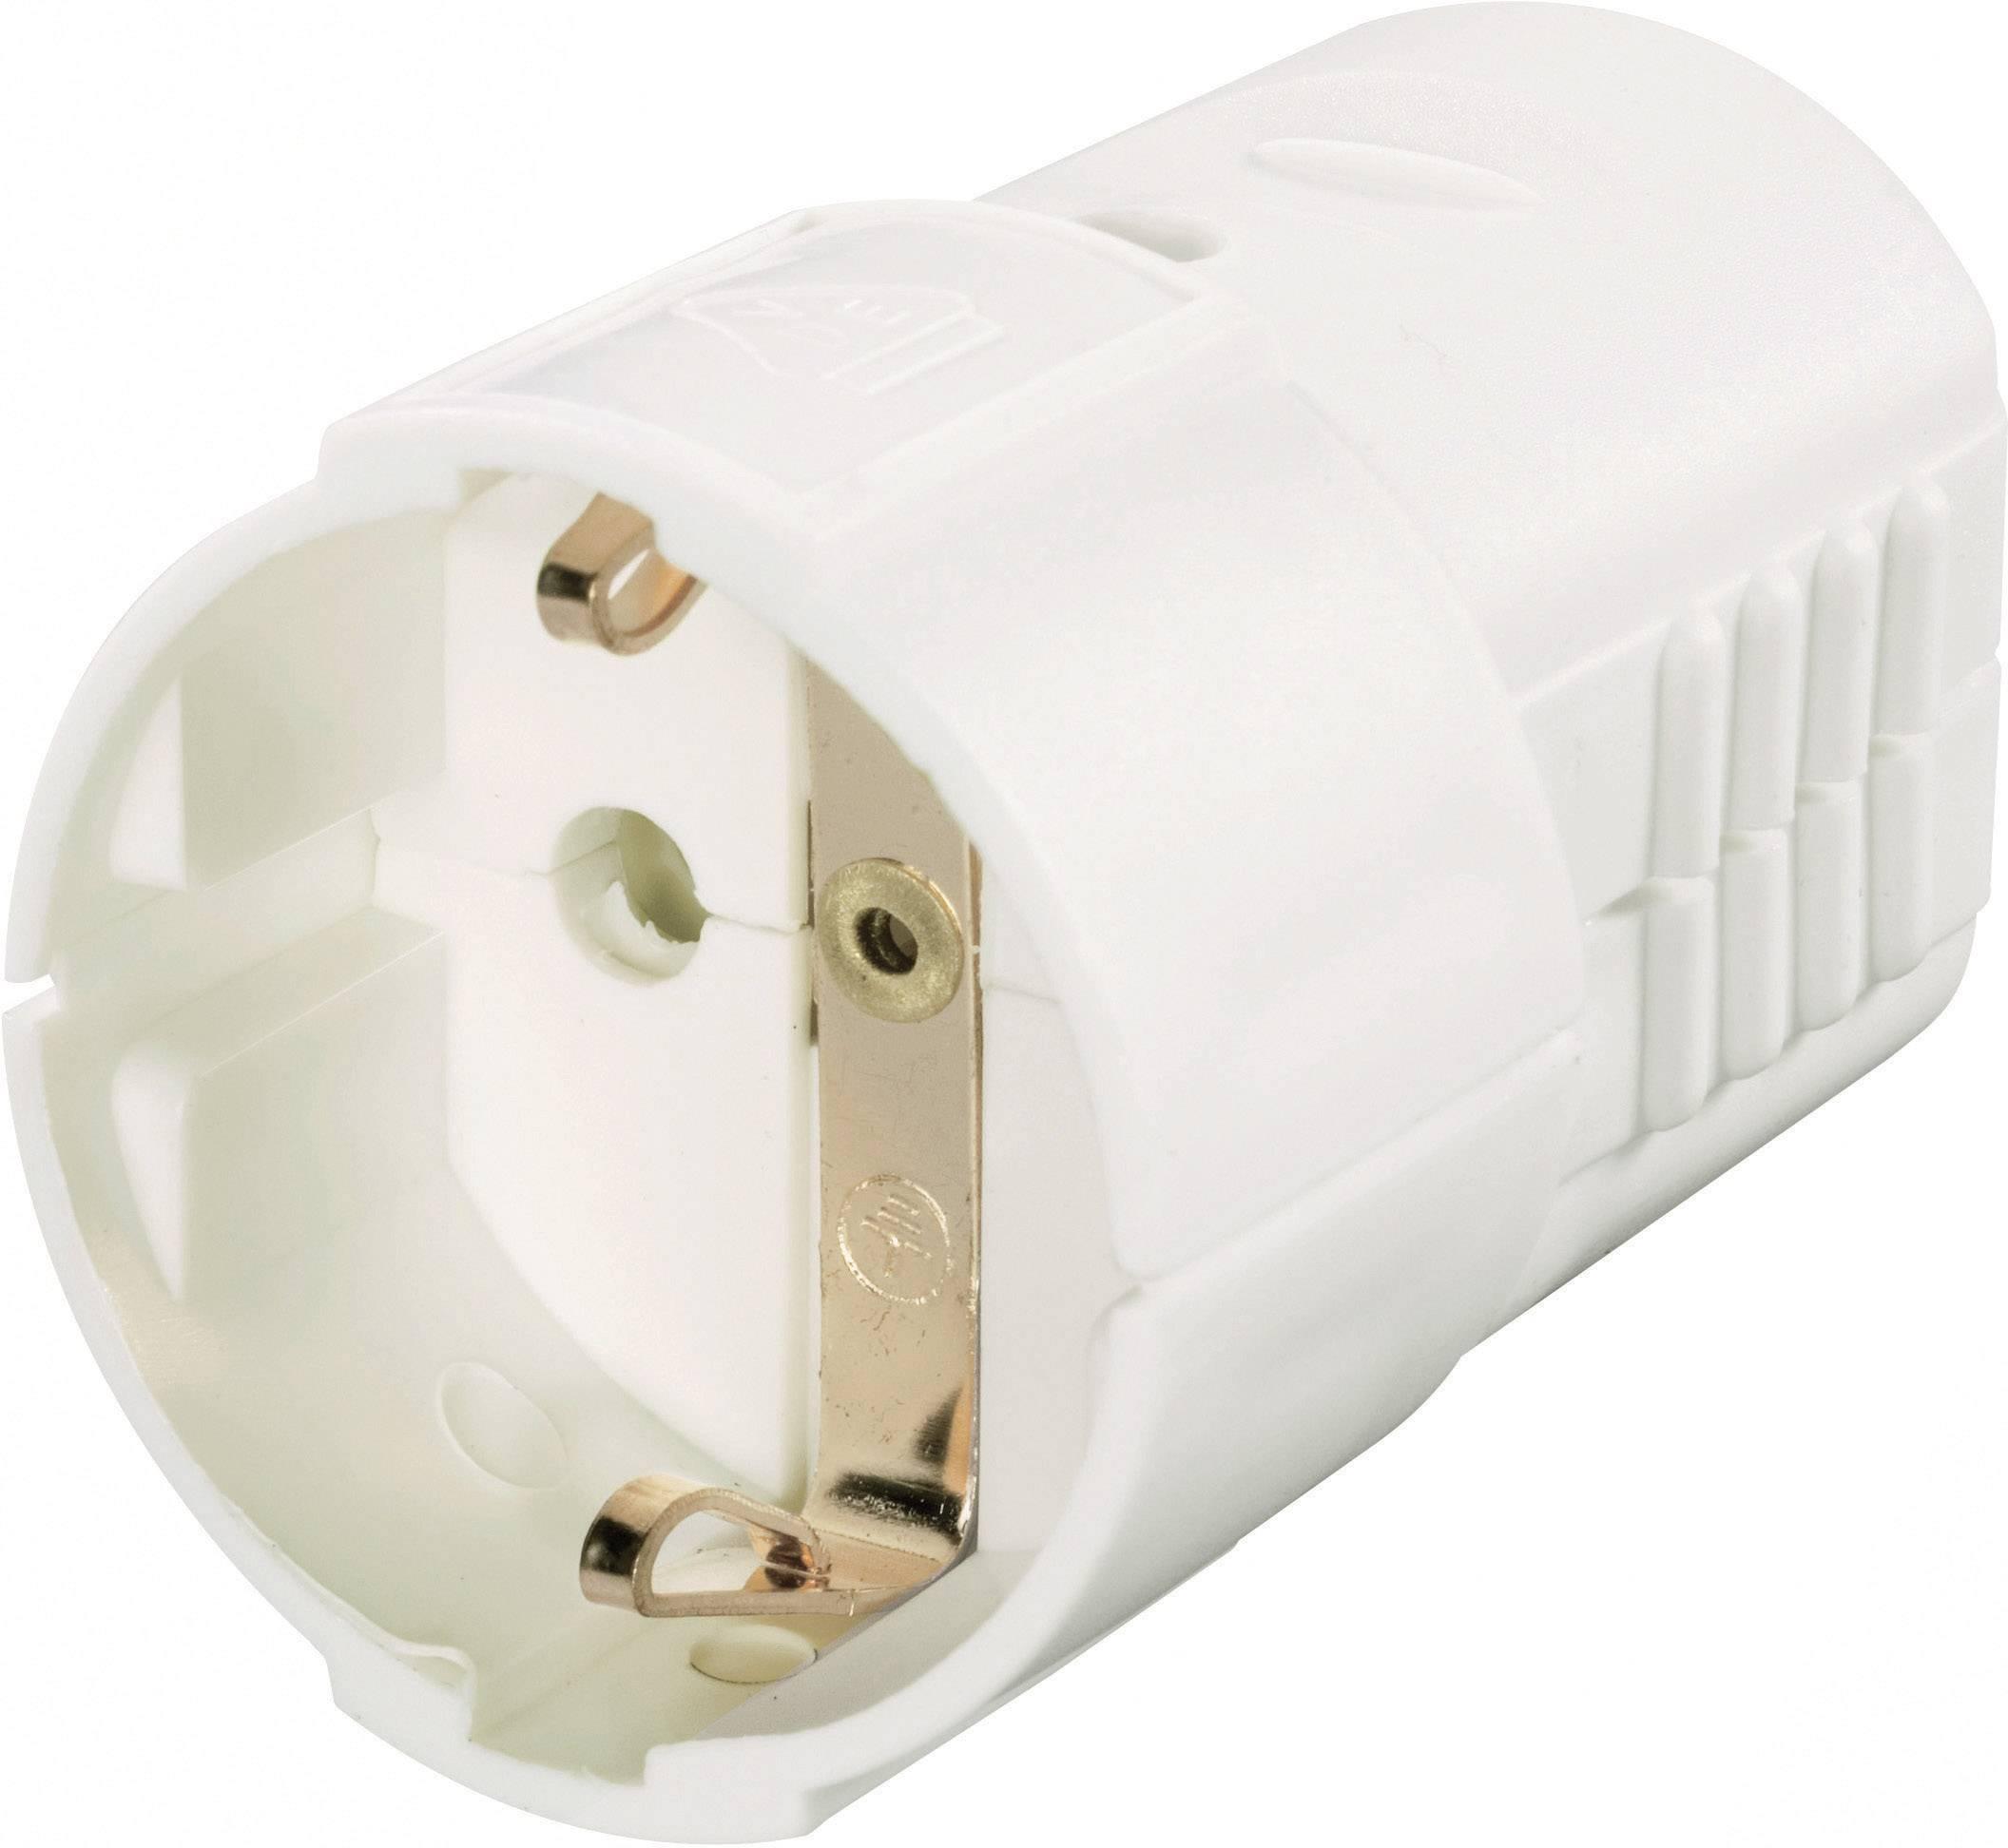 Prepojka SchuKo umelá hmota, IP20, 230 V, biela